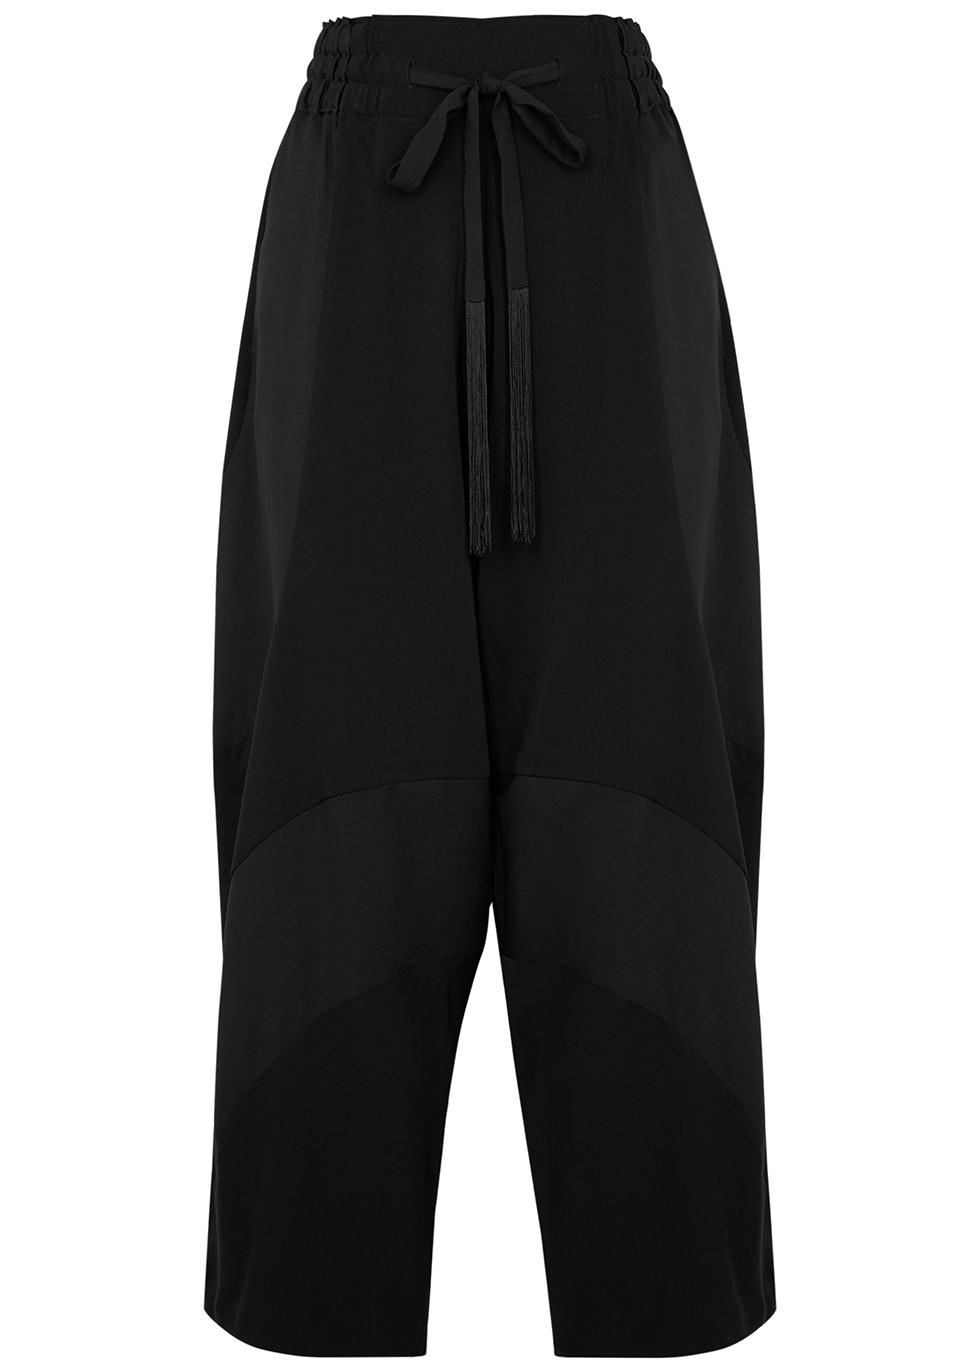 Diverge black wide-leg trousers